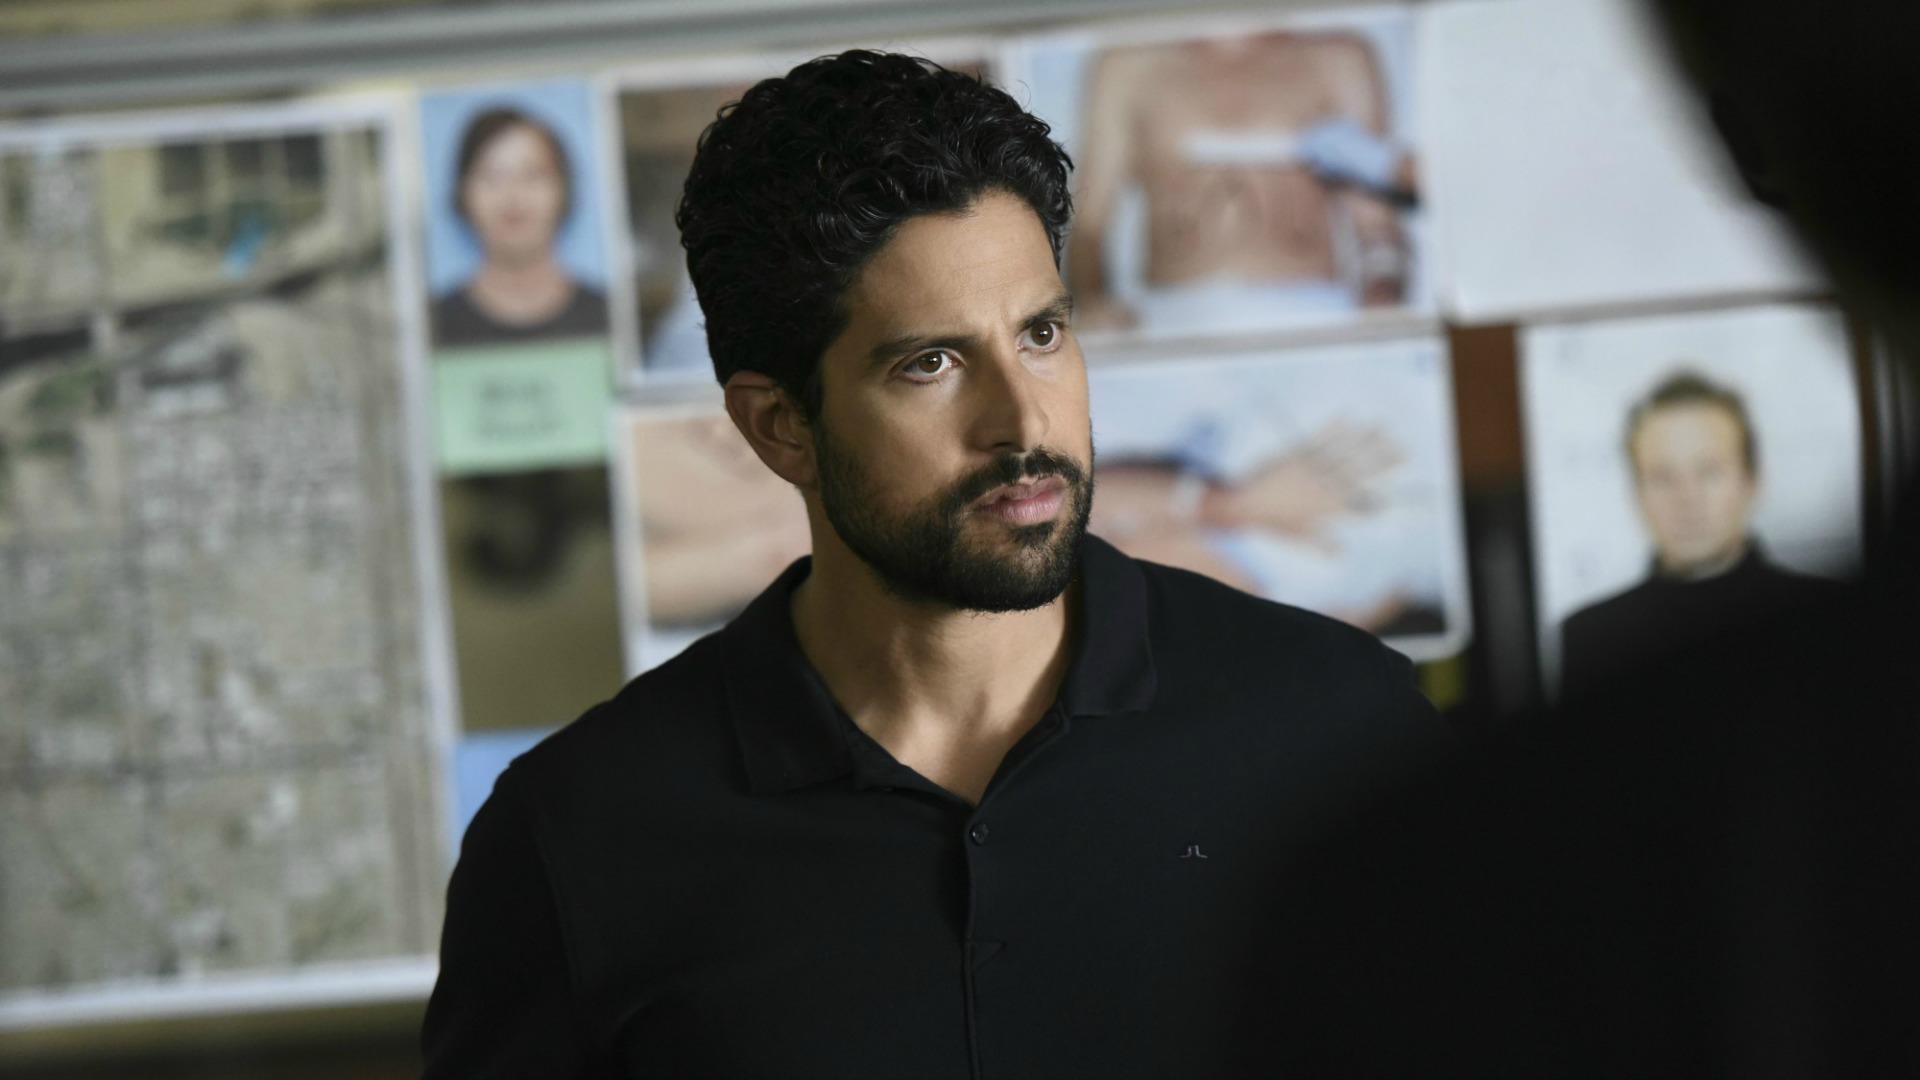 Agent Luke Alvez discusses the profile with the team.